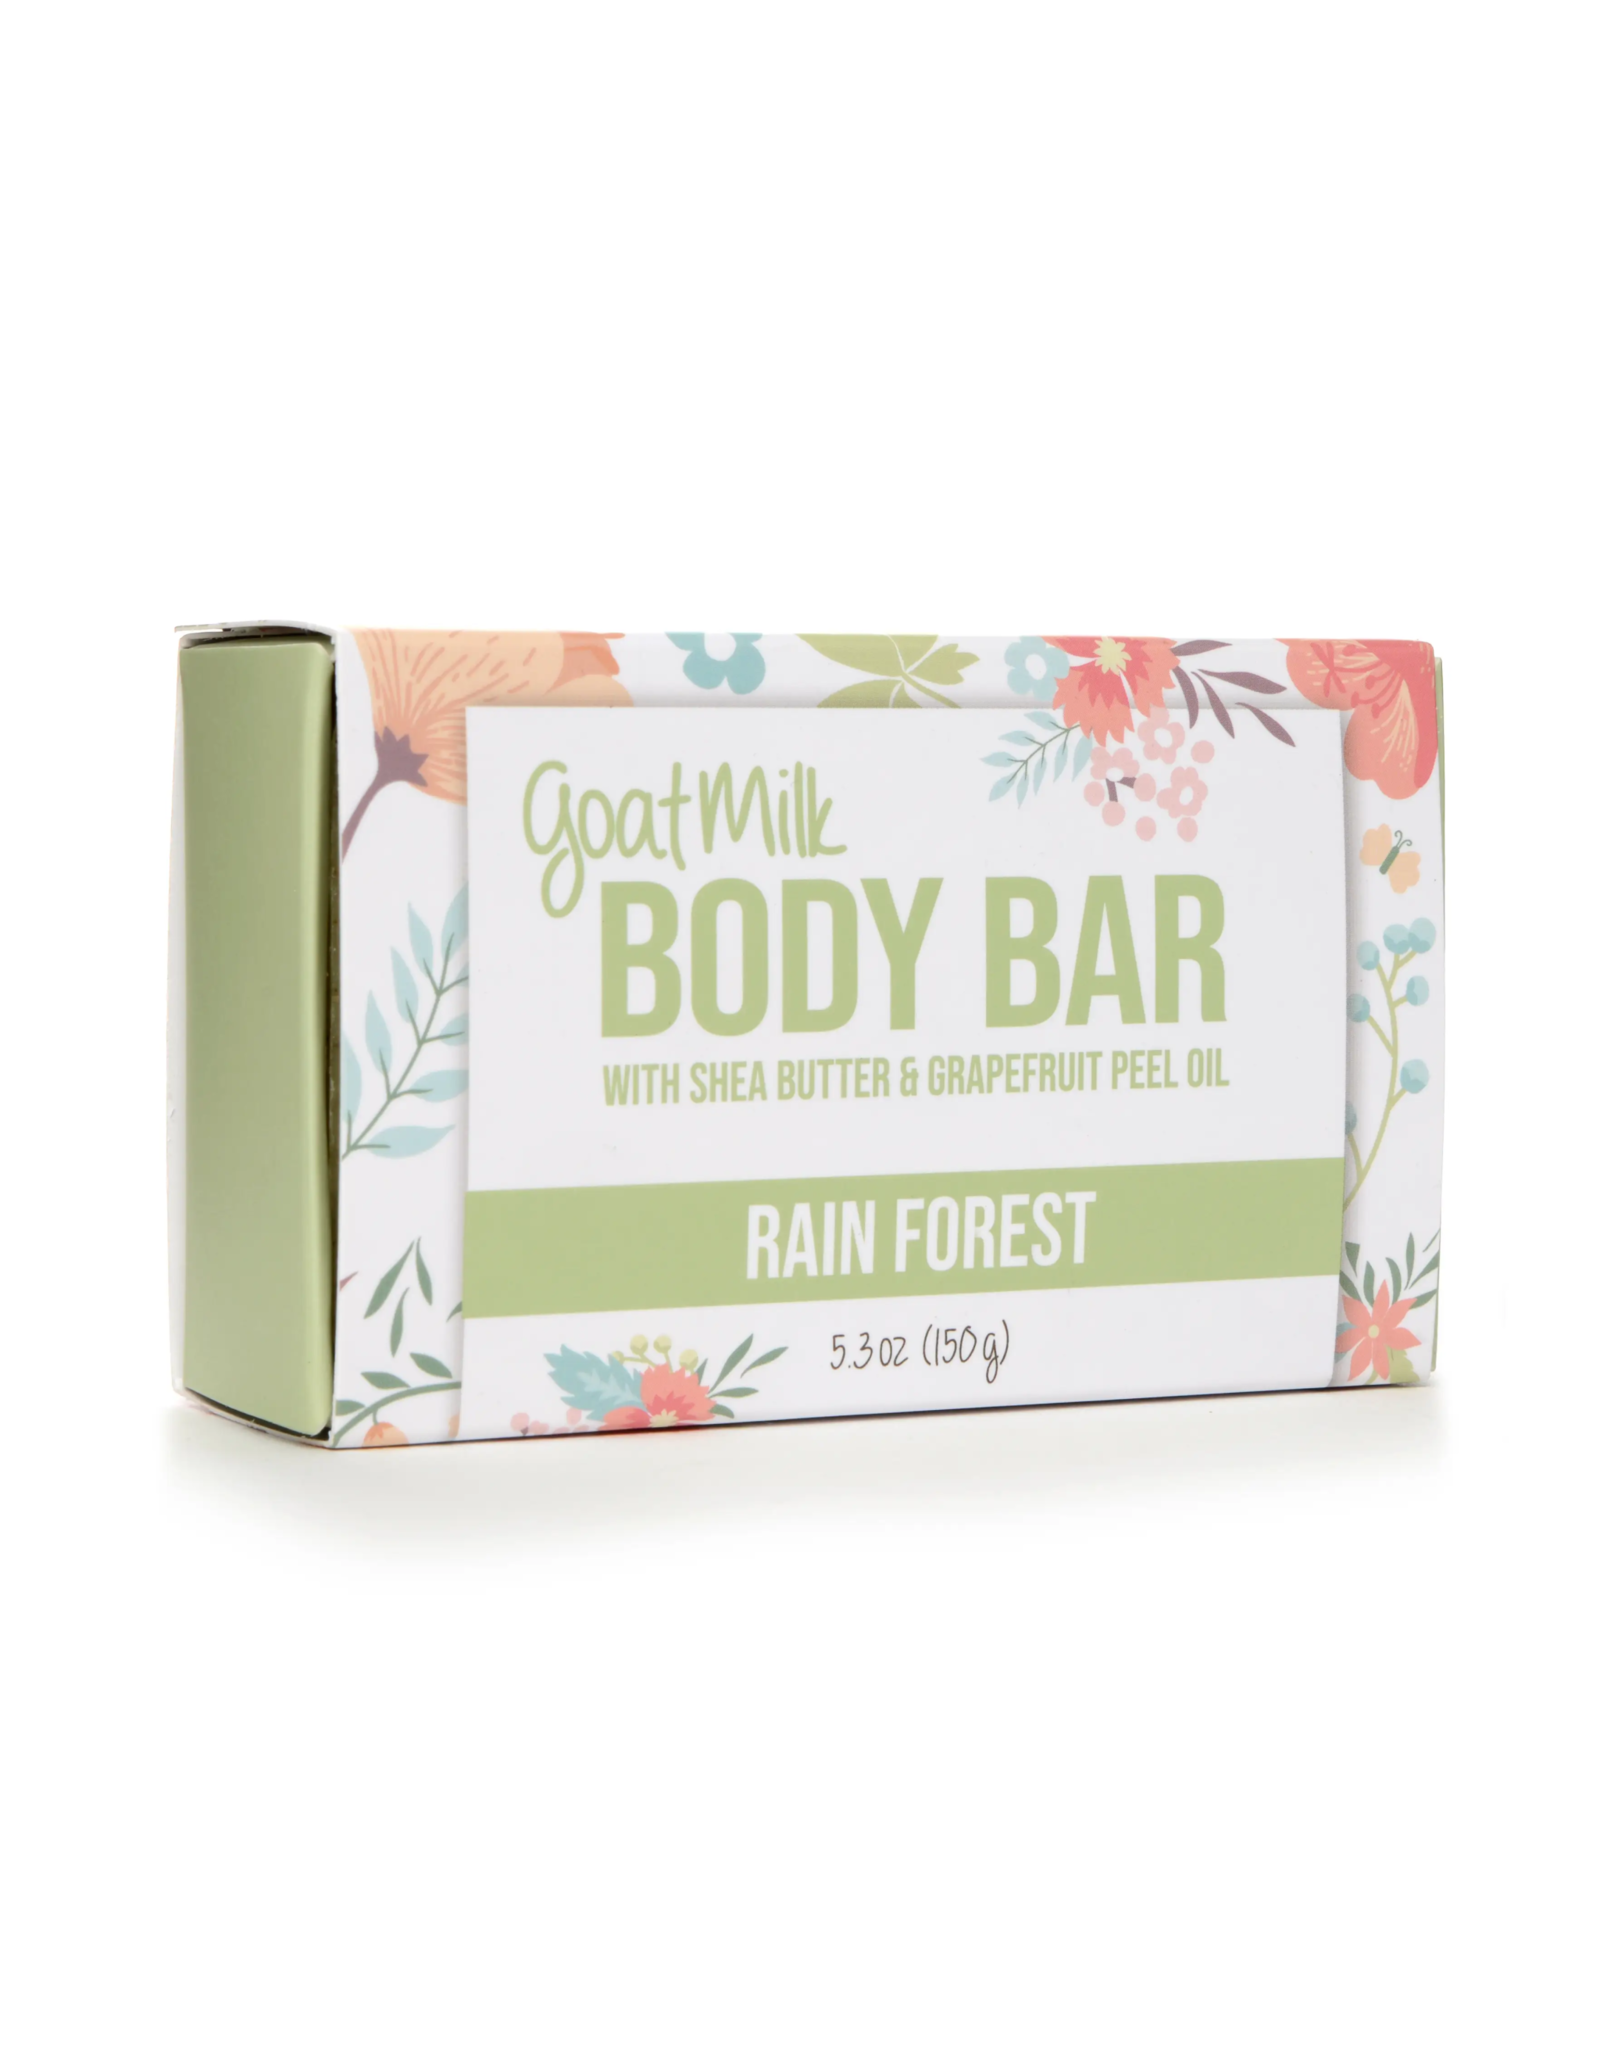 Rainforest Goat Milk Body Bar